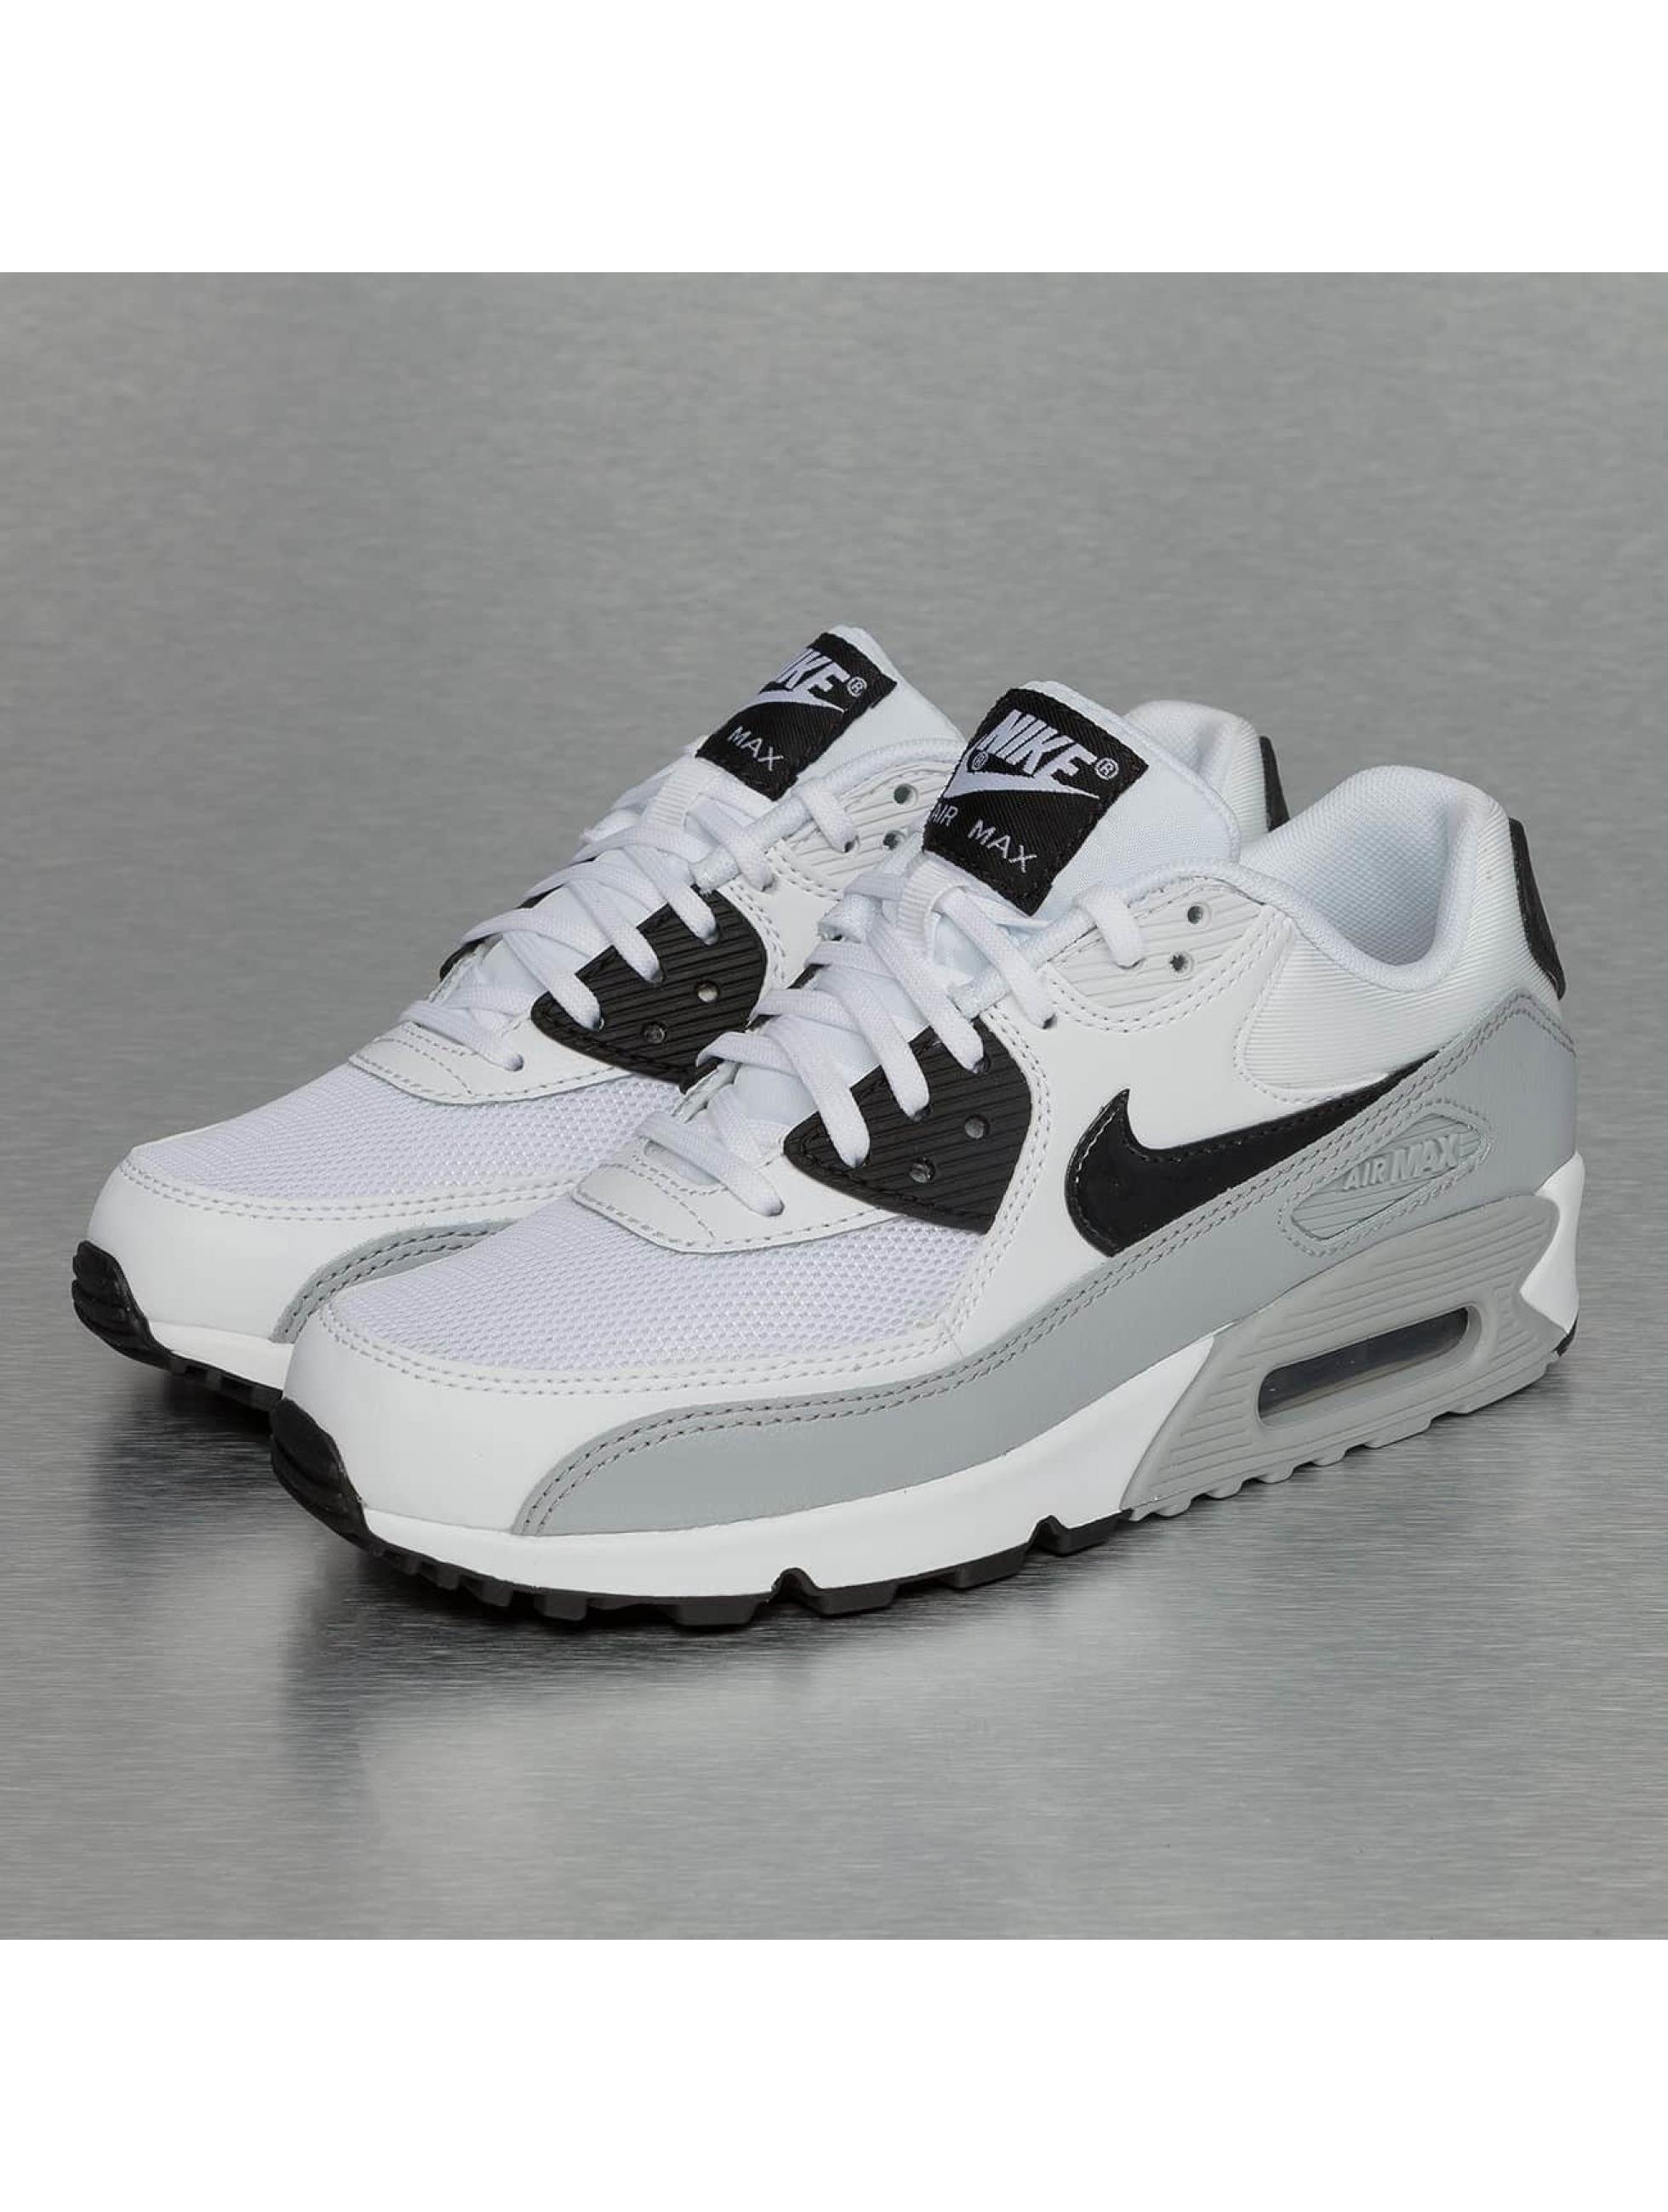 nike sneaker air max 90 essential in wei 256778. Black Bedroom Furniture Sets. Home Design Ideas